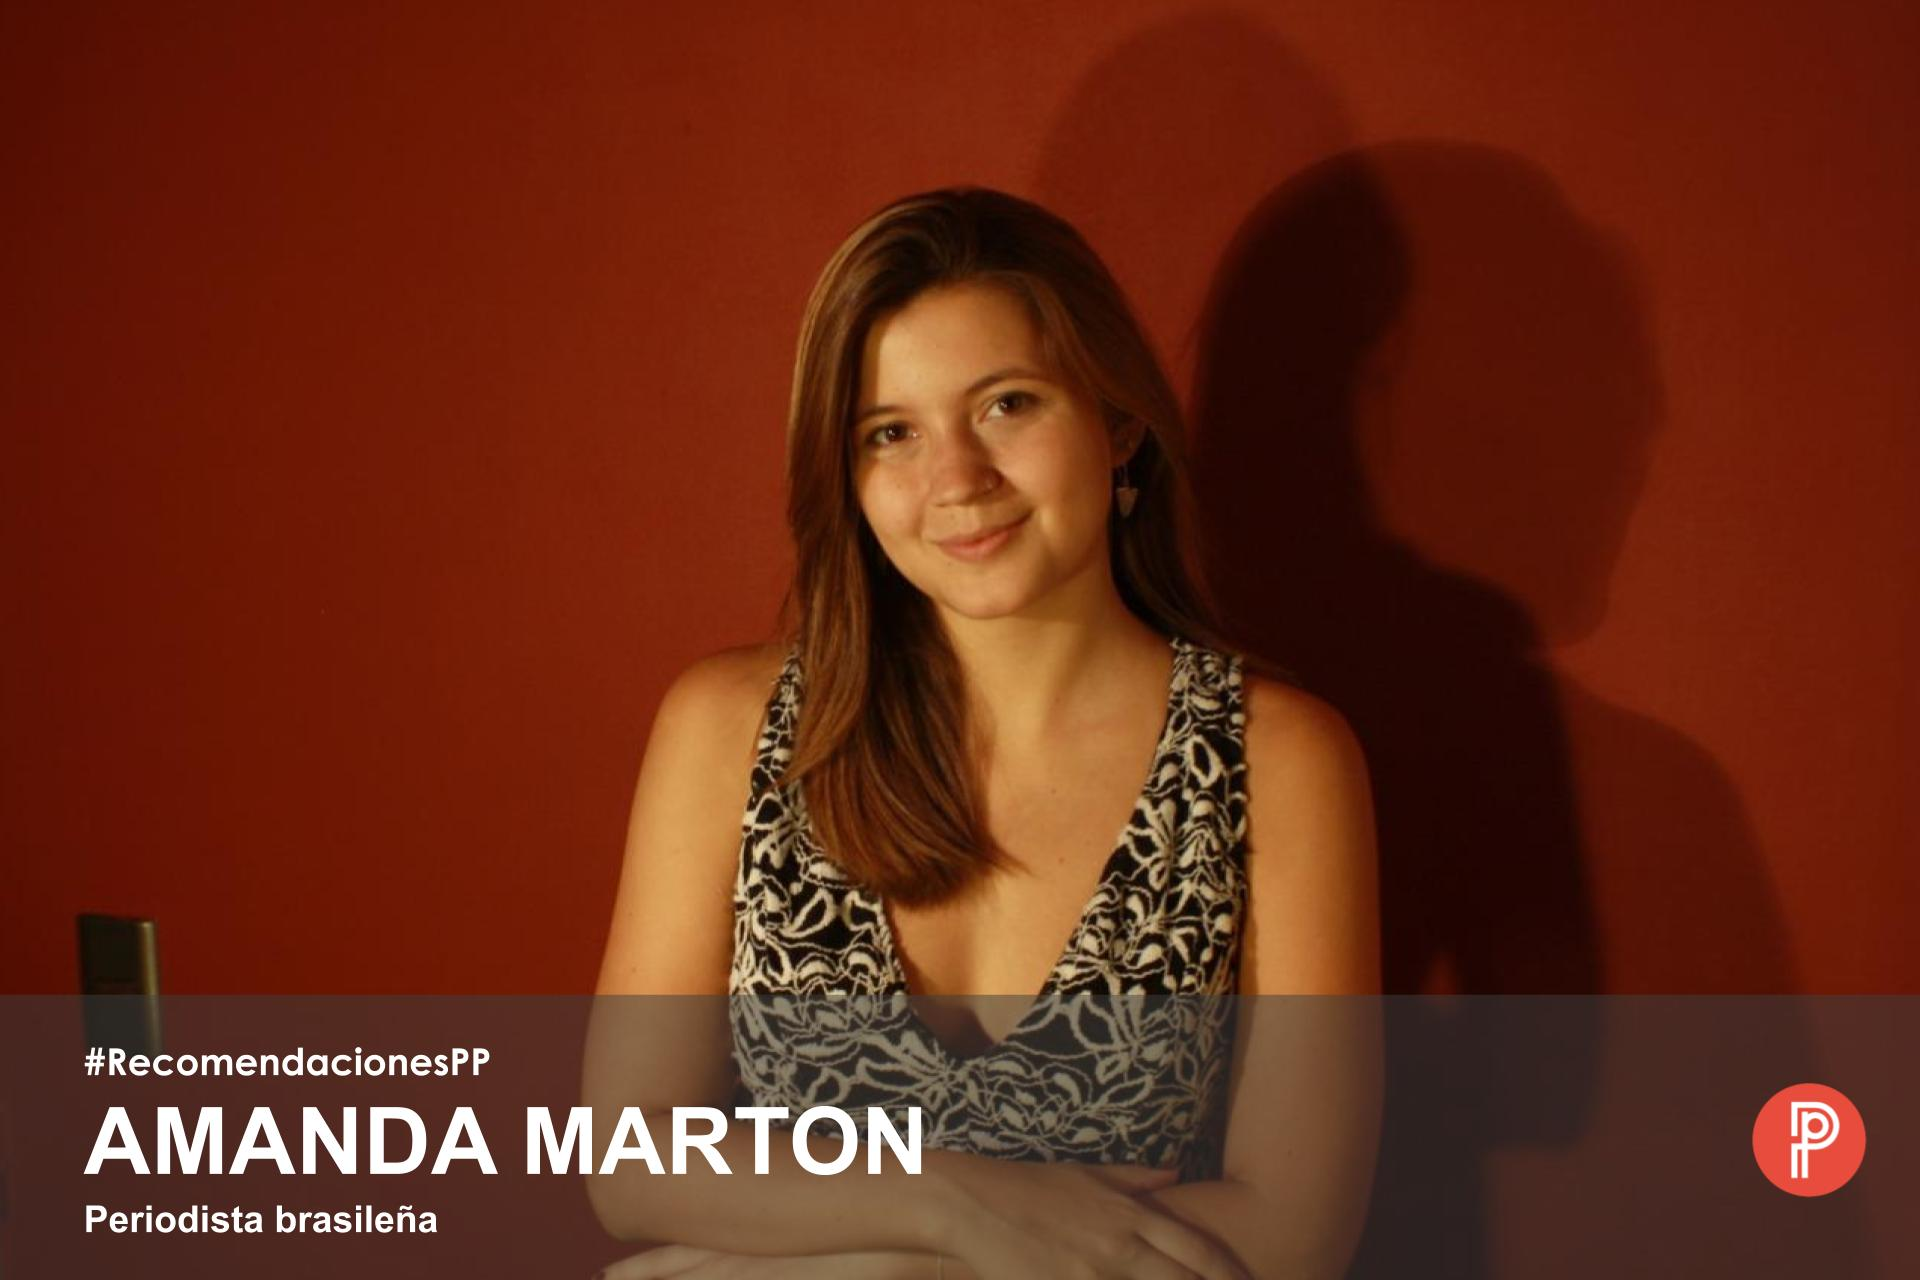 amanda_marton